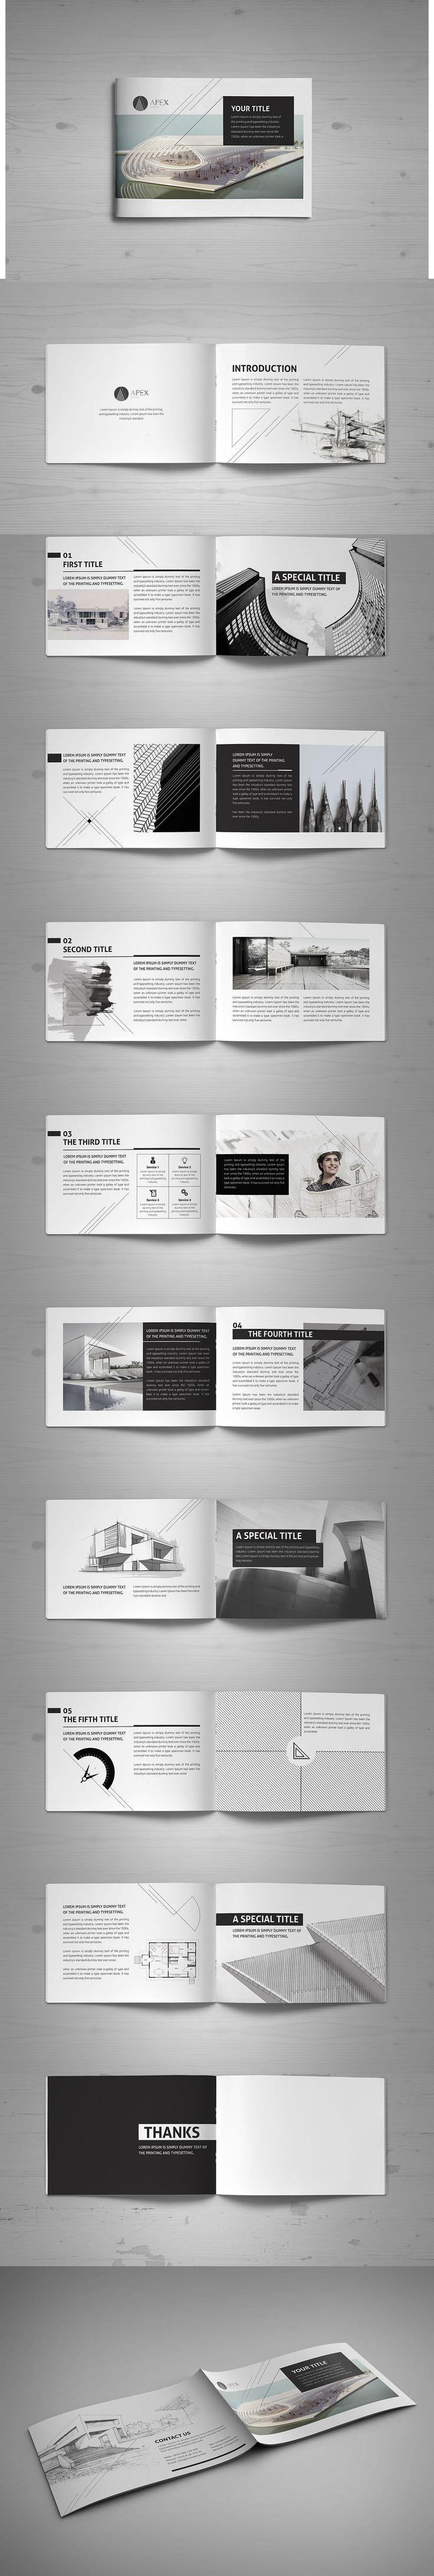 Minimal Modern Black & White Architecture Brochure Template InDesign INDD